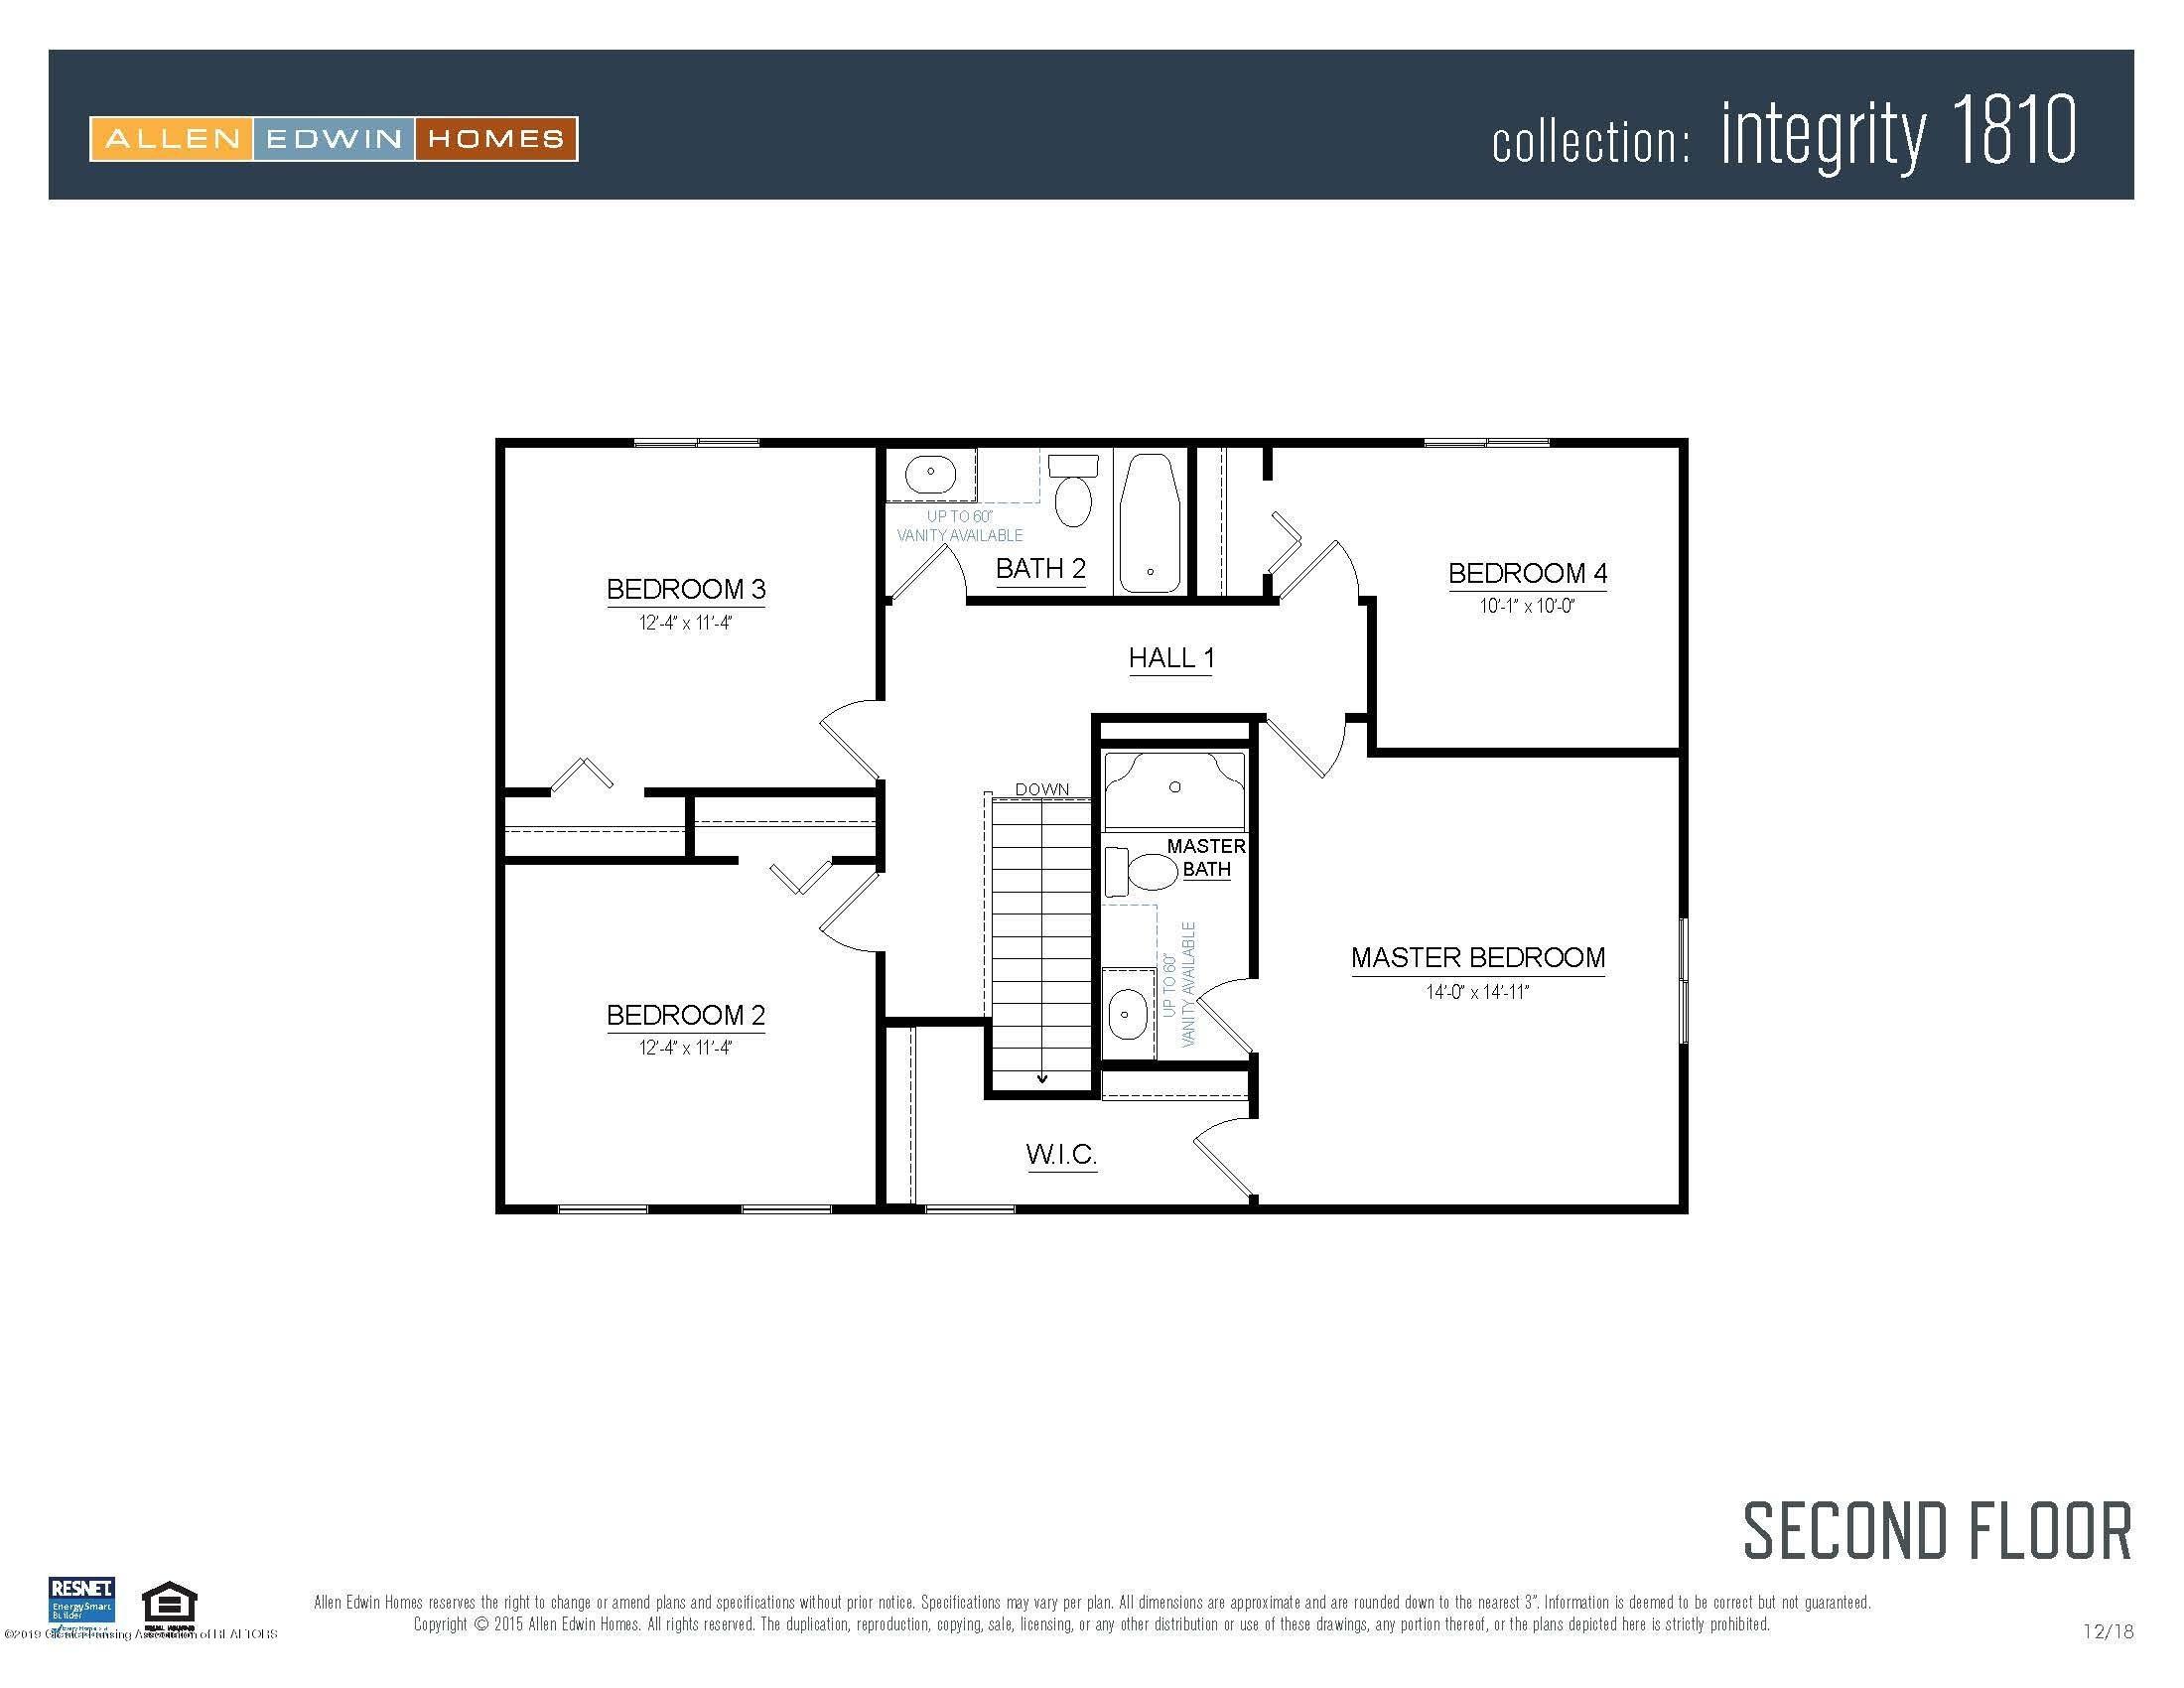 236 Noleigh - Integrity 1810 V8.0a Second Floor - 3